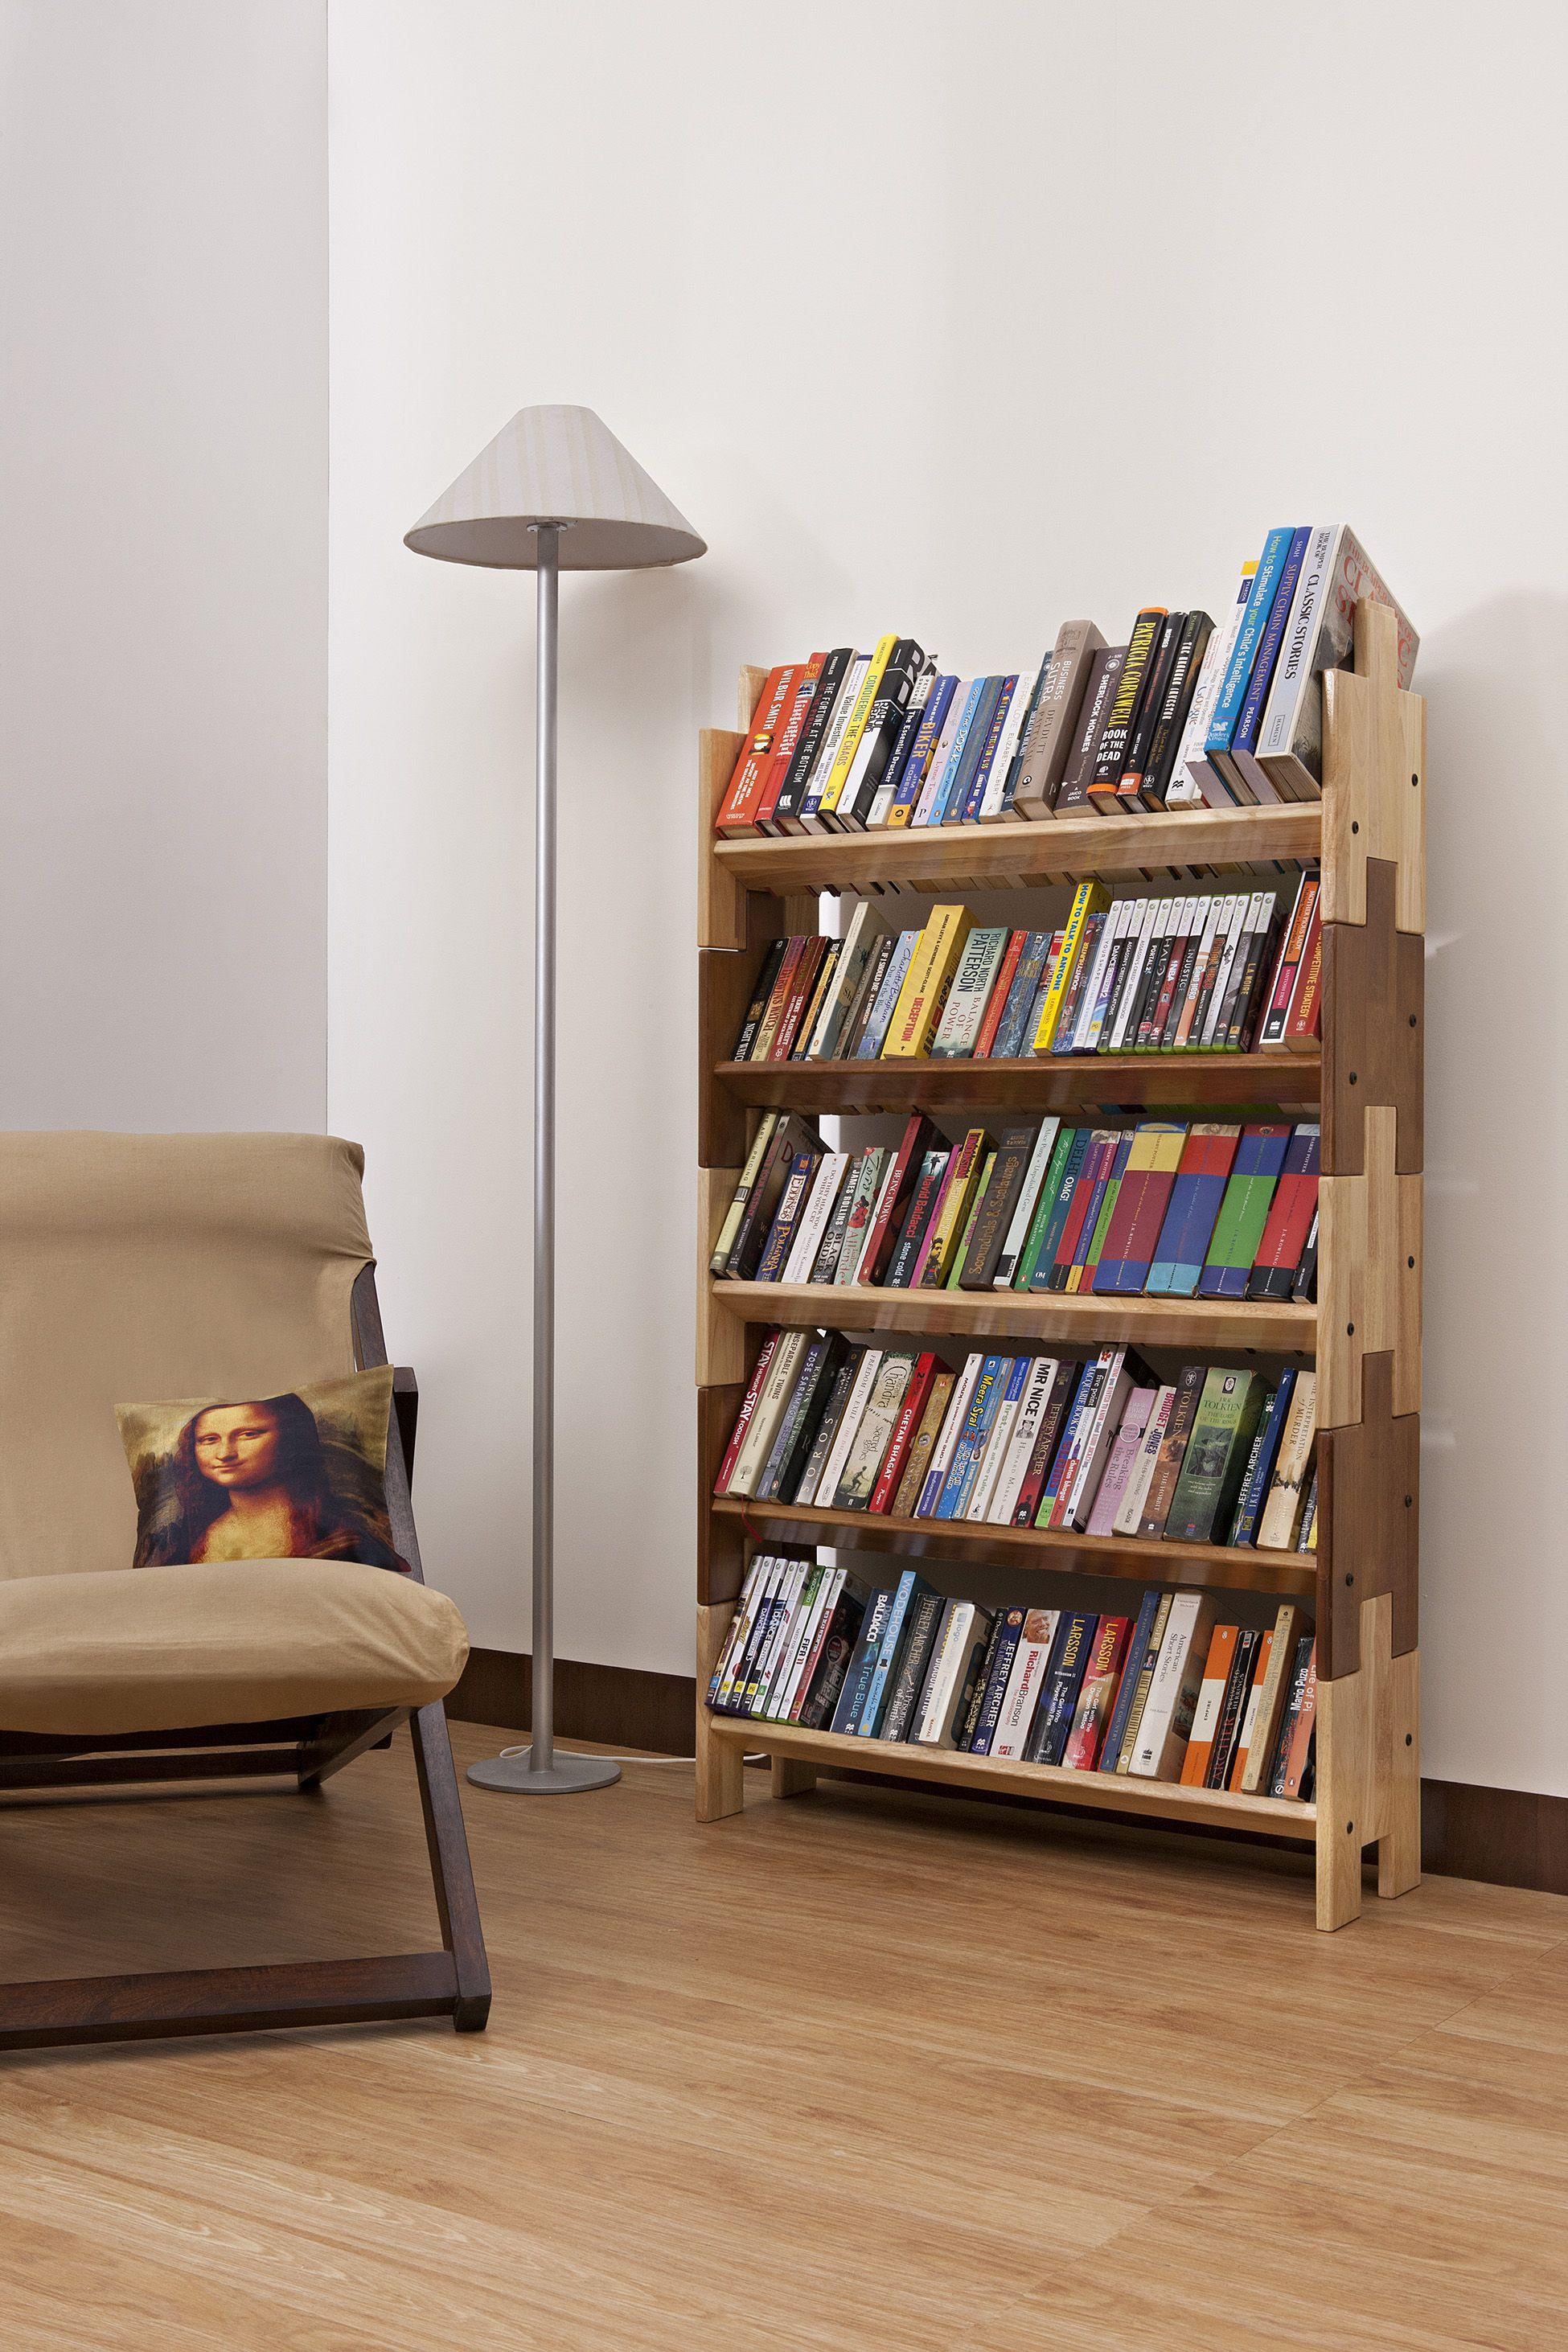 Dewey Book Shelf / Modular Book Shelf : http://www.urbanladder.